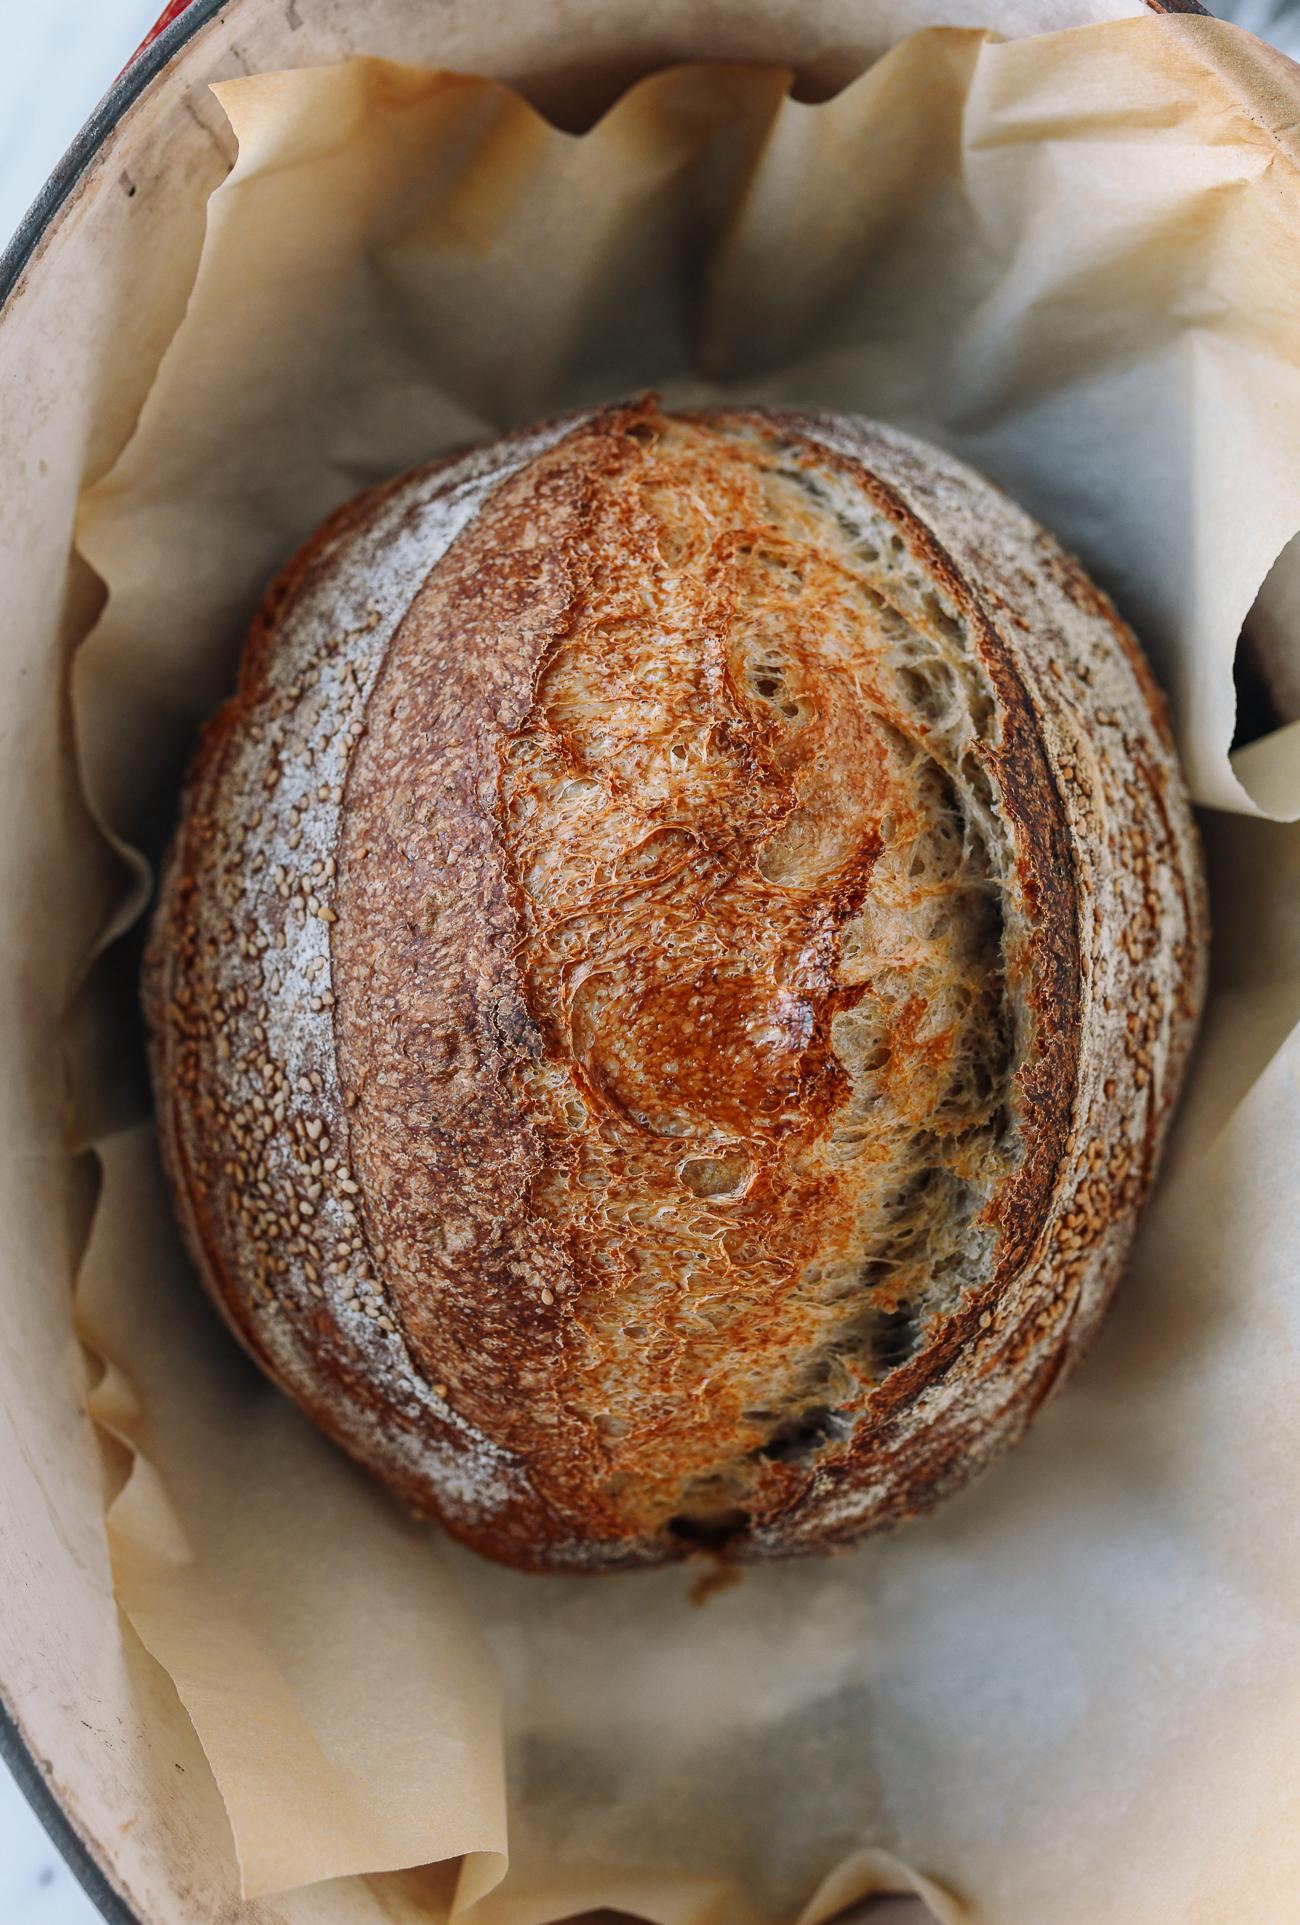 Baked sourdough loaf in Dutch oven